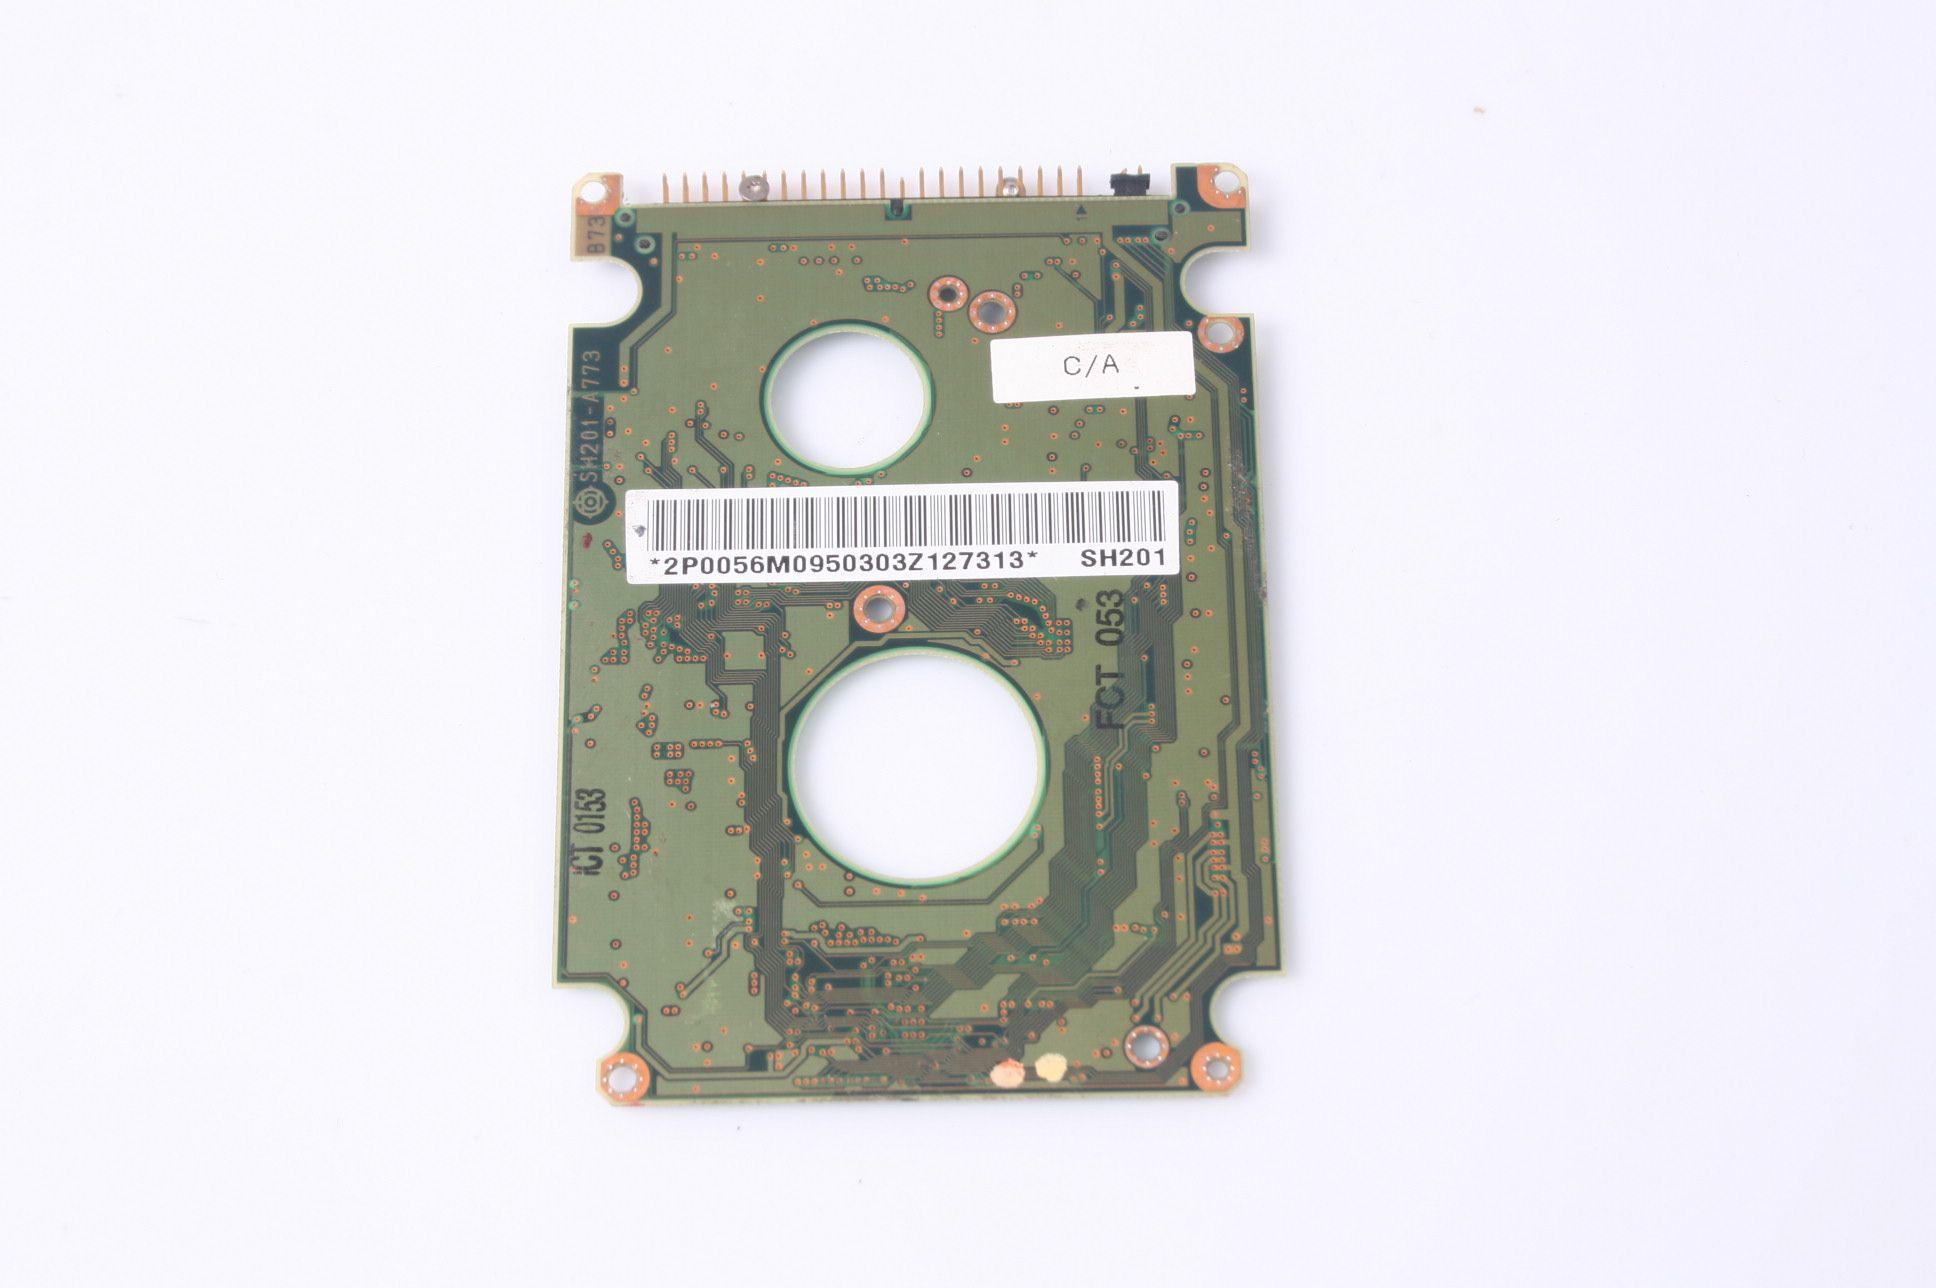 HITACHI DK23AA-12 12GB 2.5 IDE HARD DRIVE / PCB (CIRCUIT BOARD) ONLY FOR DA